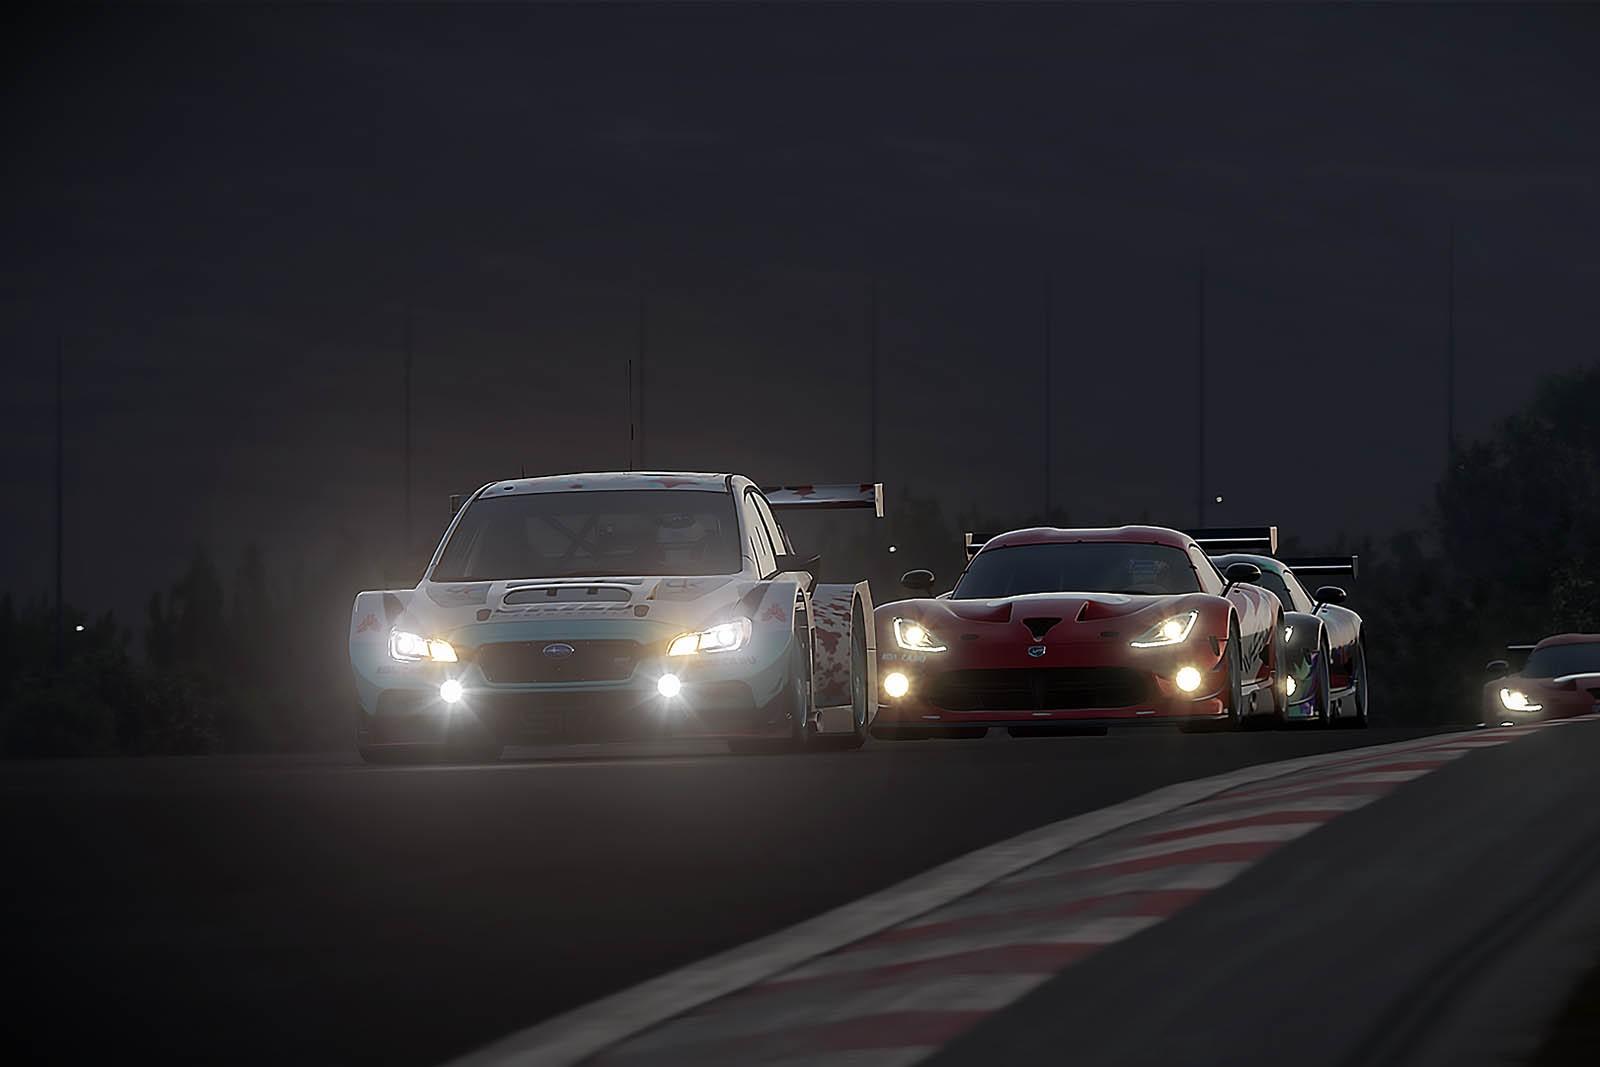 Wheel to Wheel запустили пилотный сезон по Assetto Corsa Competizione